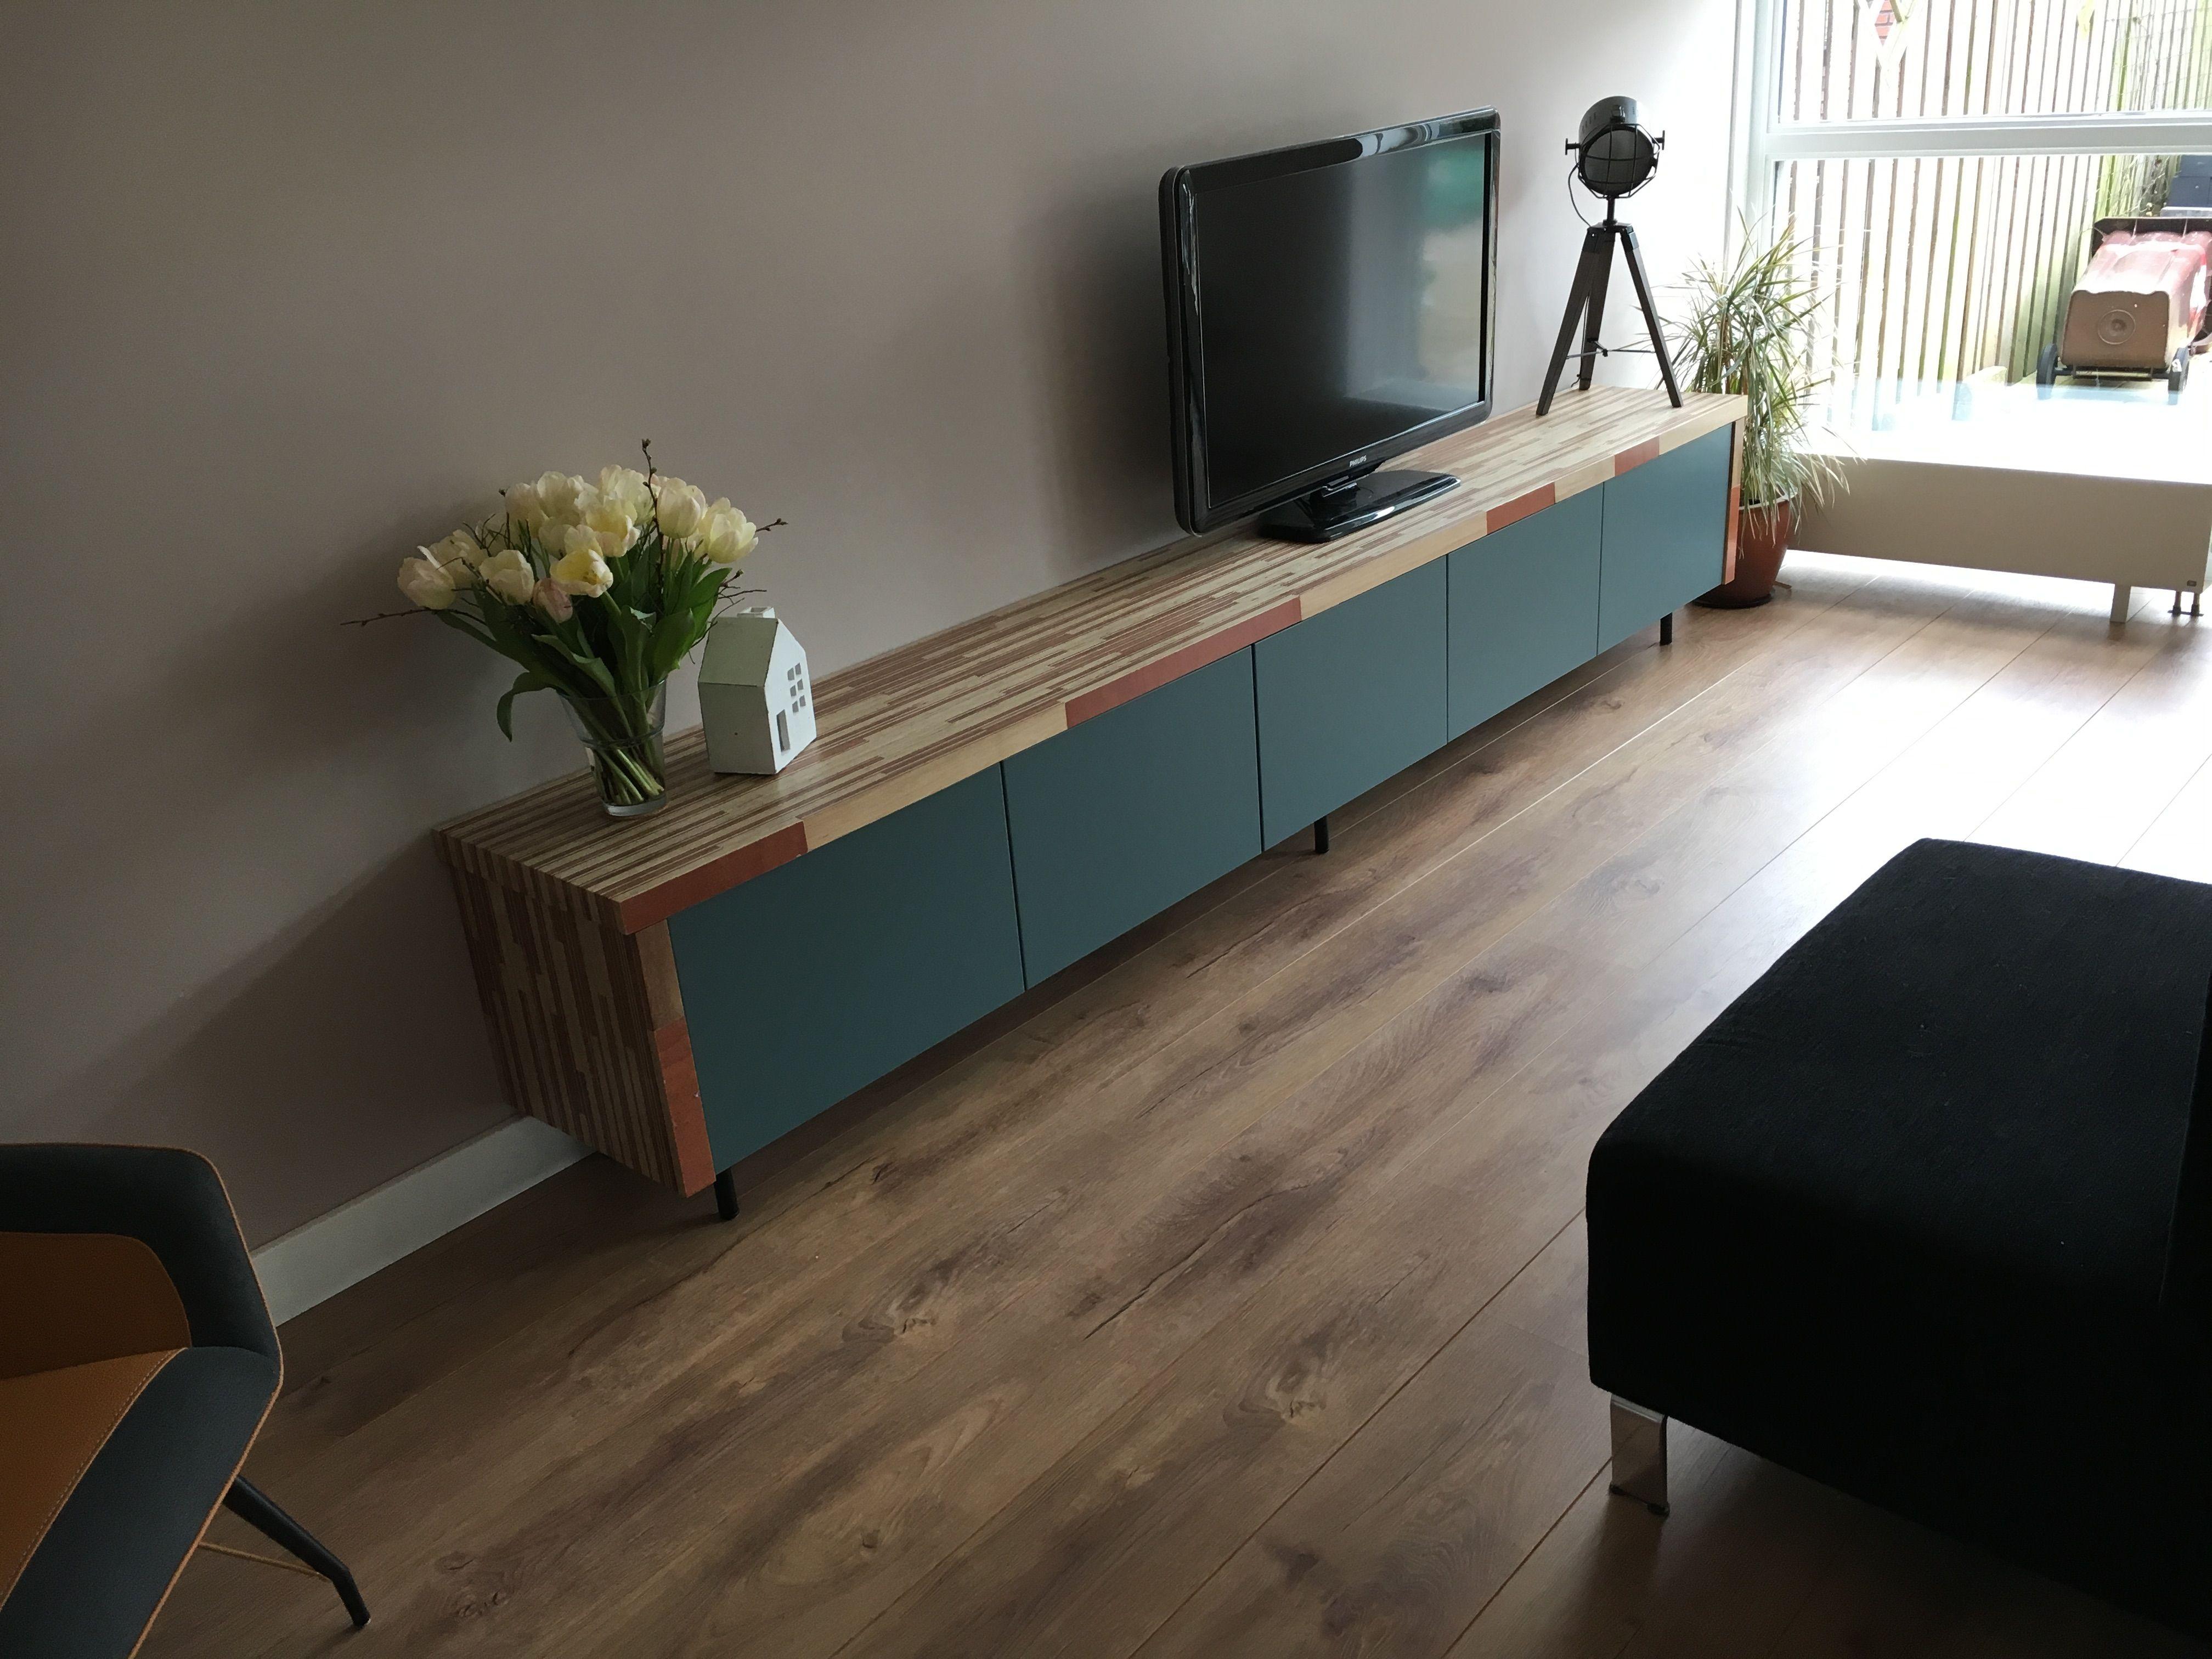 Tv Tafel Ikea : Ikea zwevende plank. zwevende keuken ikea zwevende eiken plank op